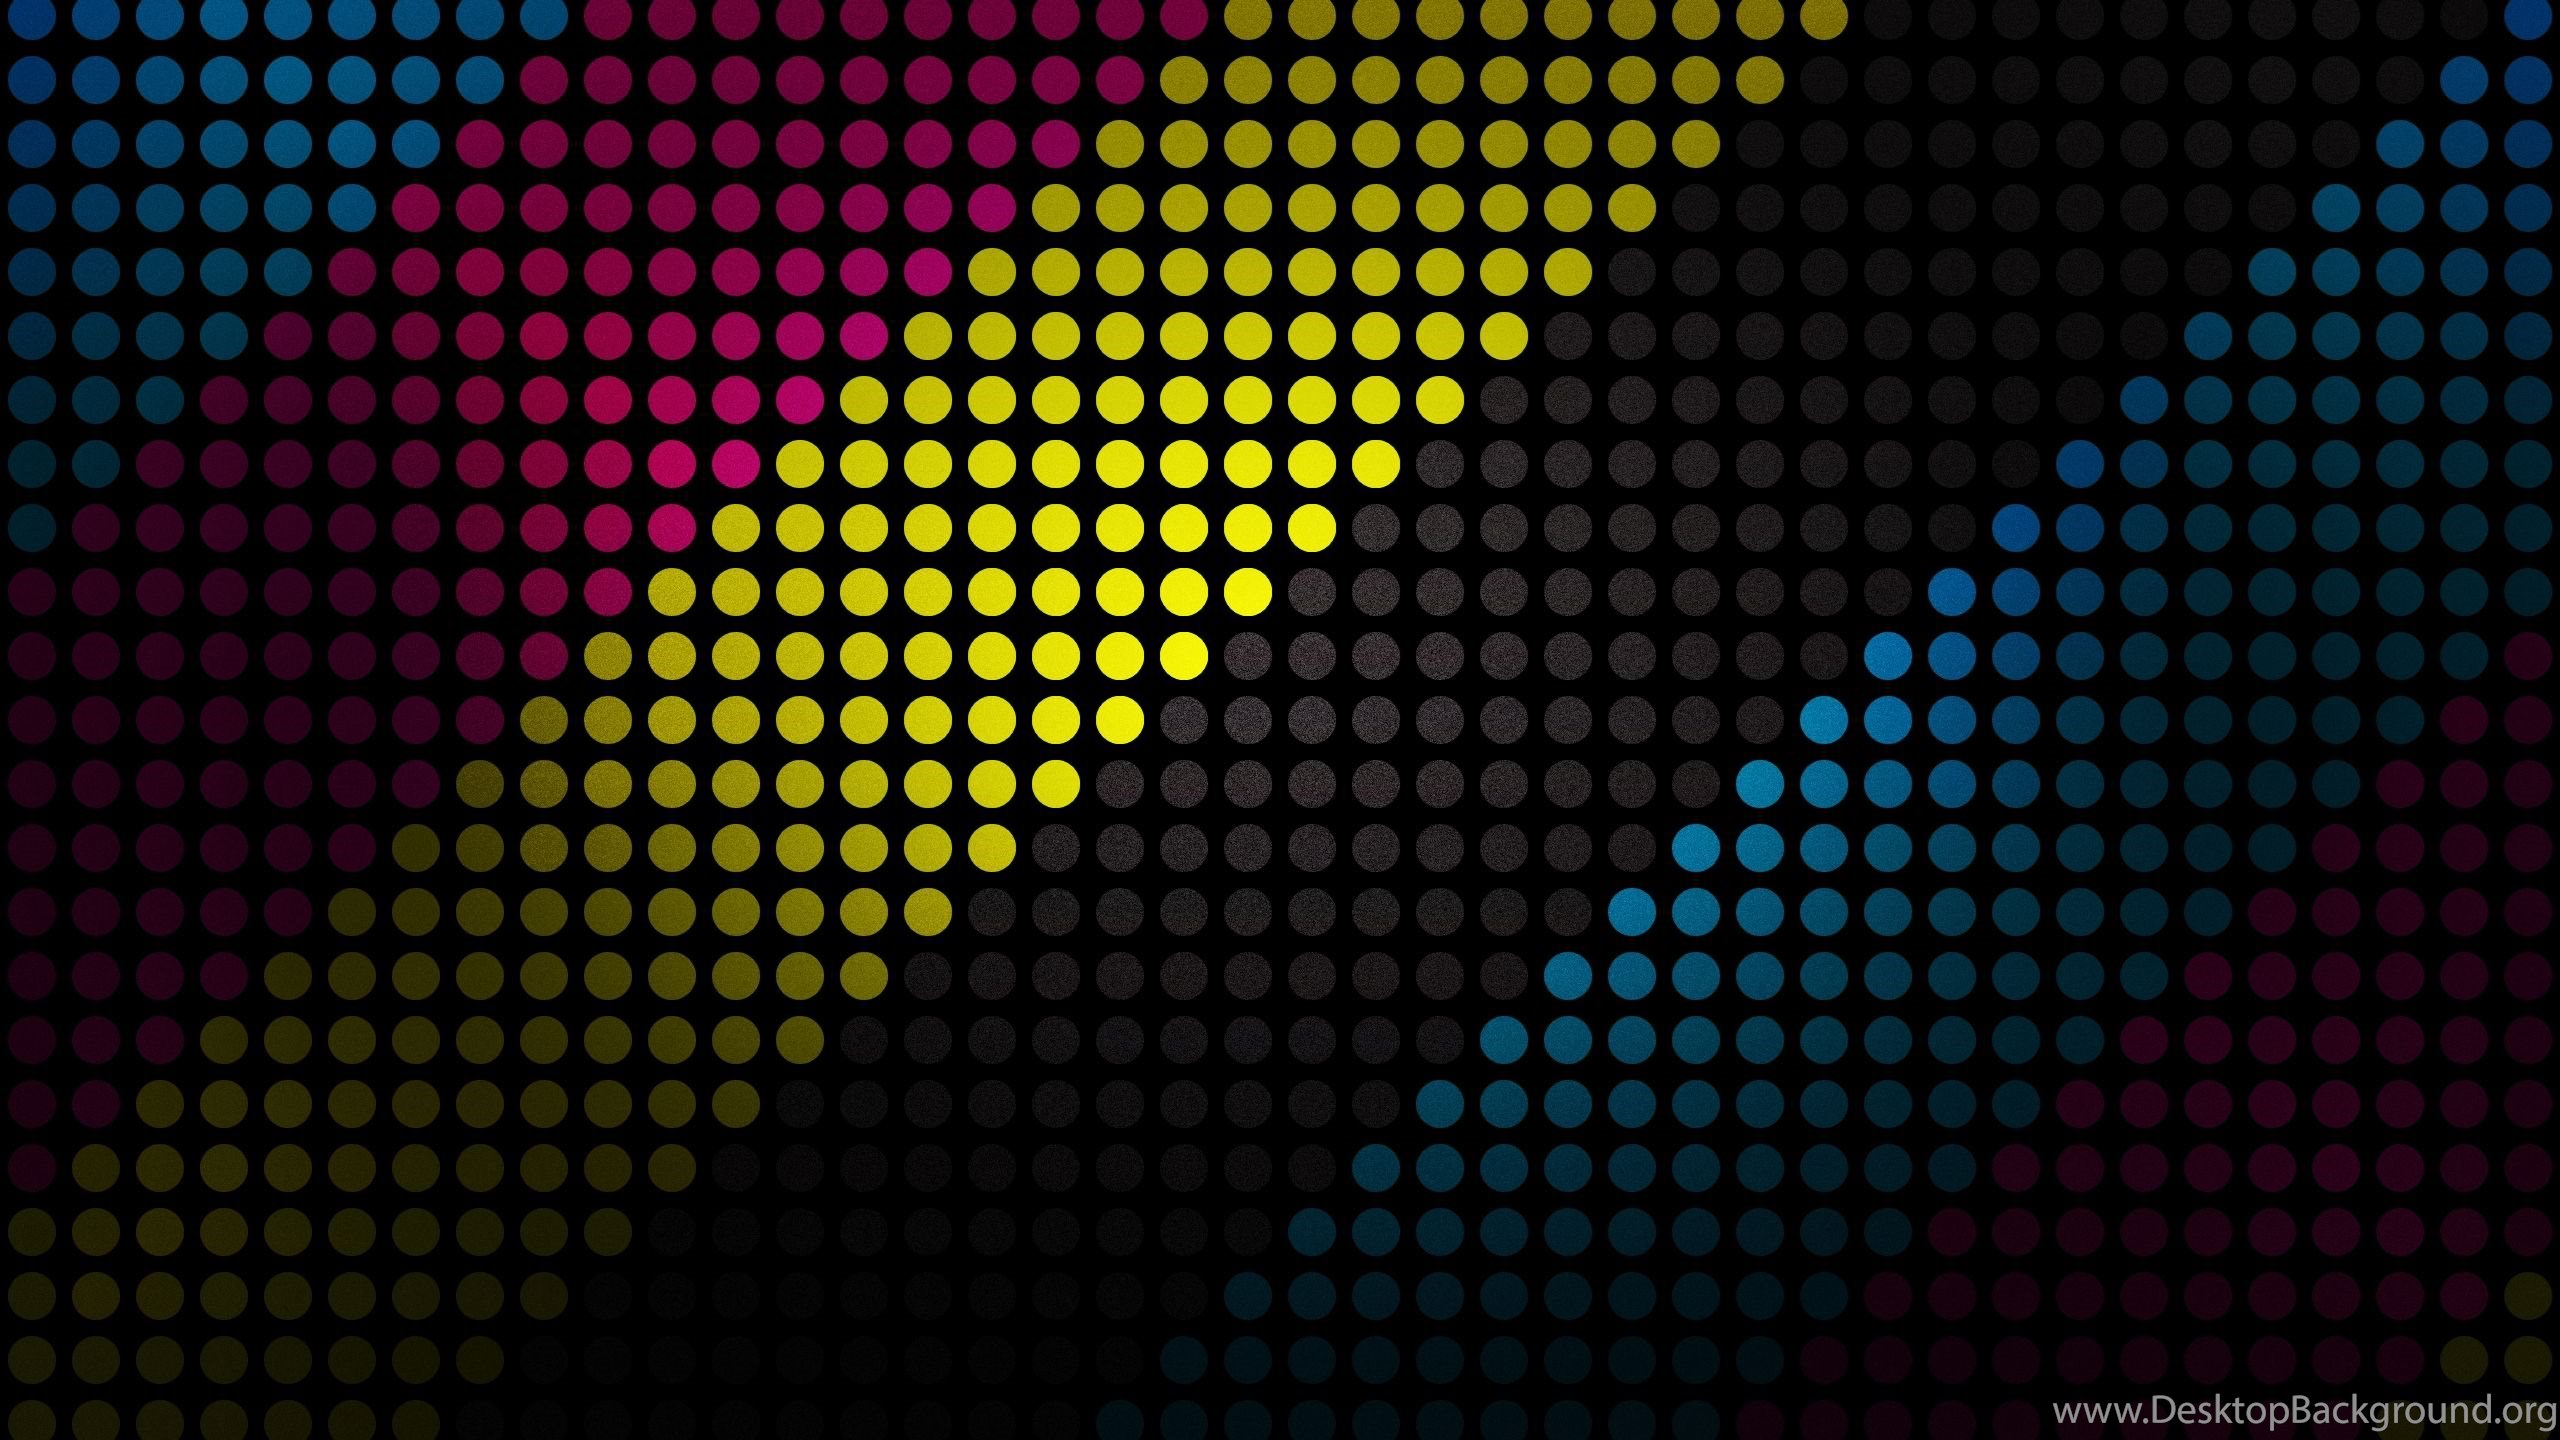 3d and abstract wallpapers hd desktop backgrounds page 142 desktop netbook voltagebd Gallery